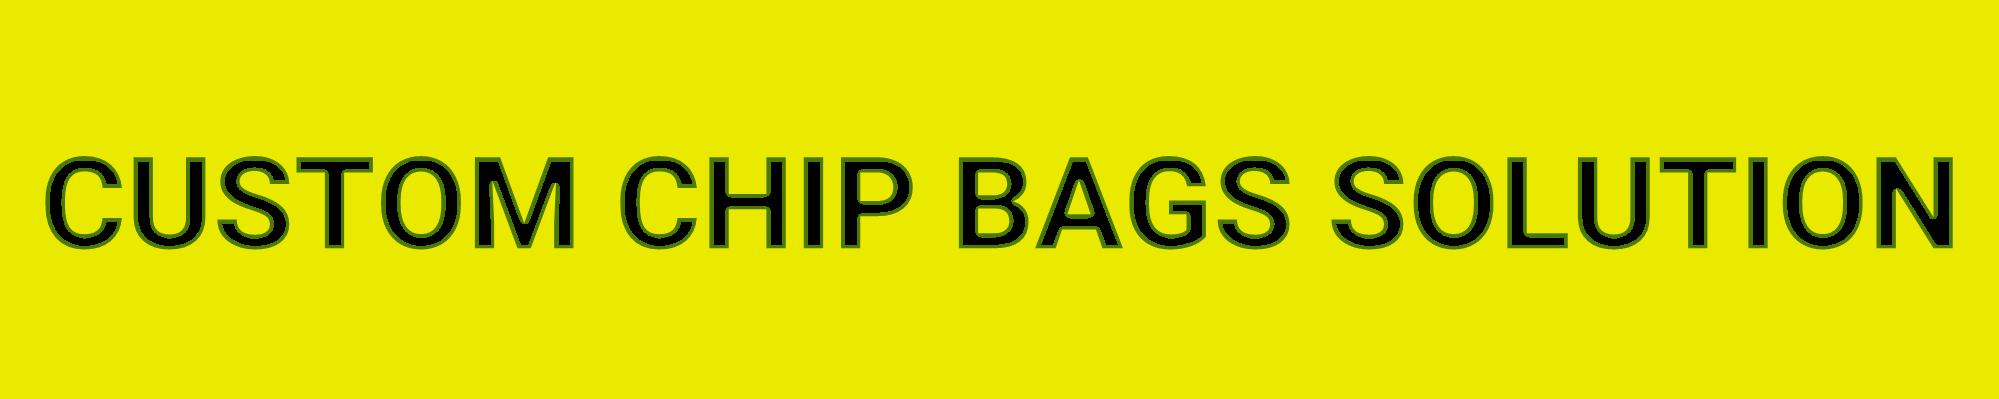 CUSTOM CHIP BAGS SOLUTION